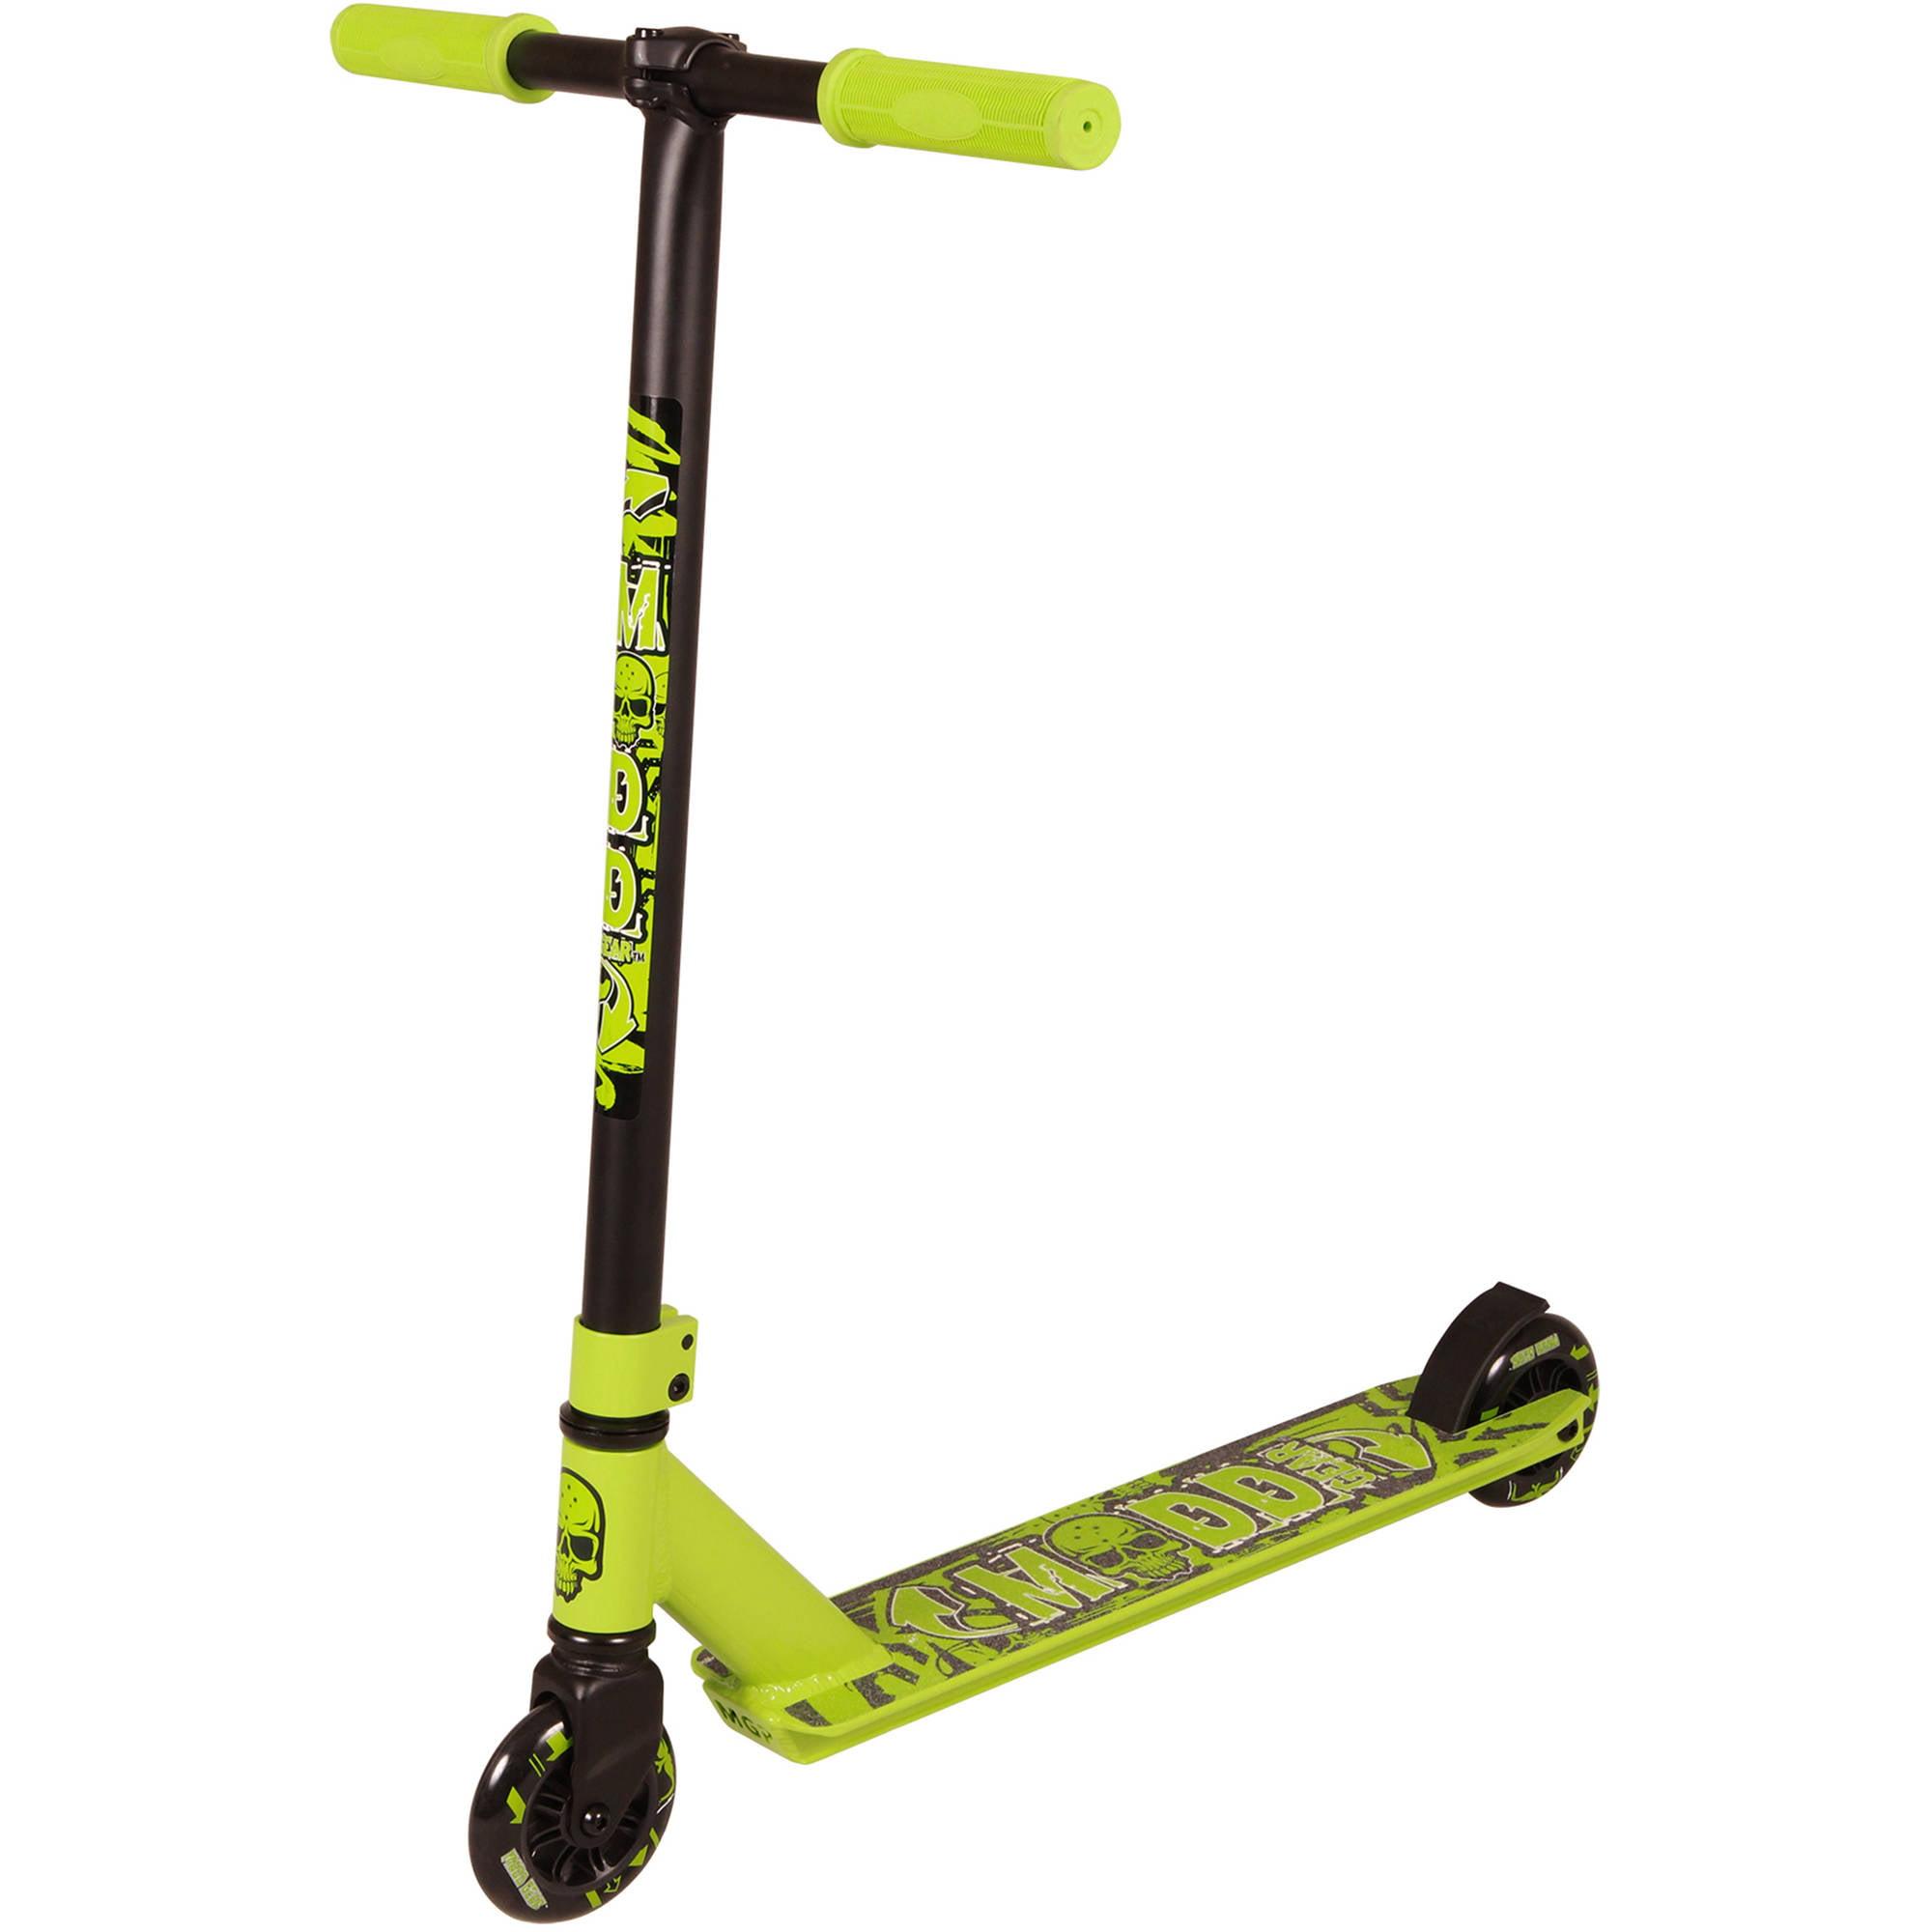 Madd scooters walmart